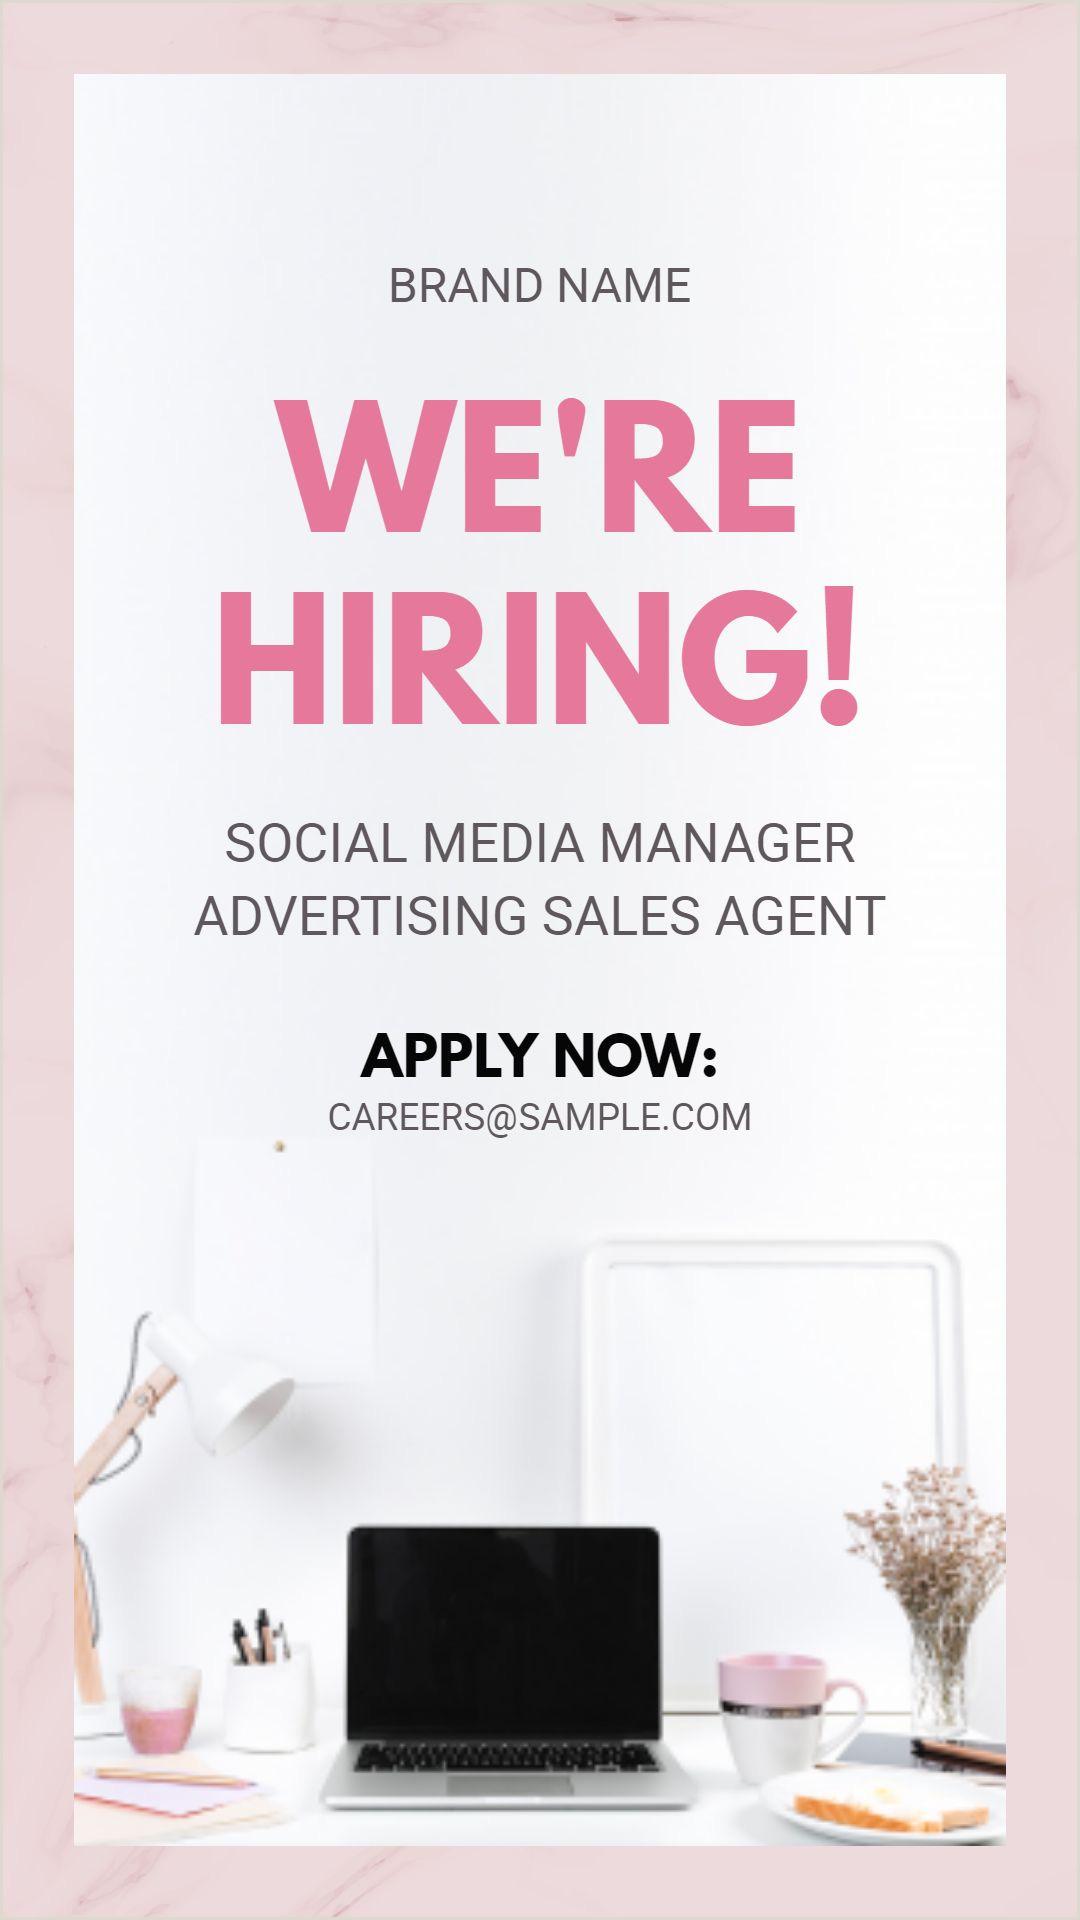 We re hiring job vacancy Instagram story ad template